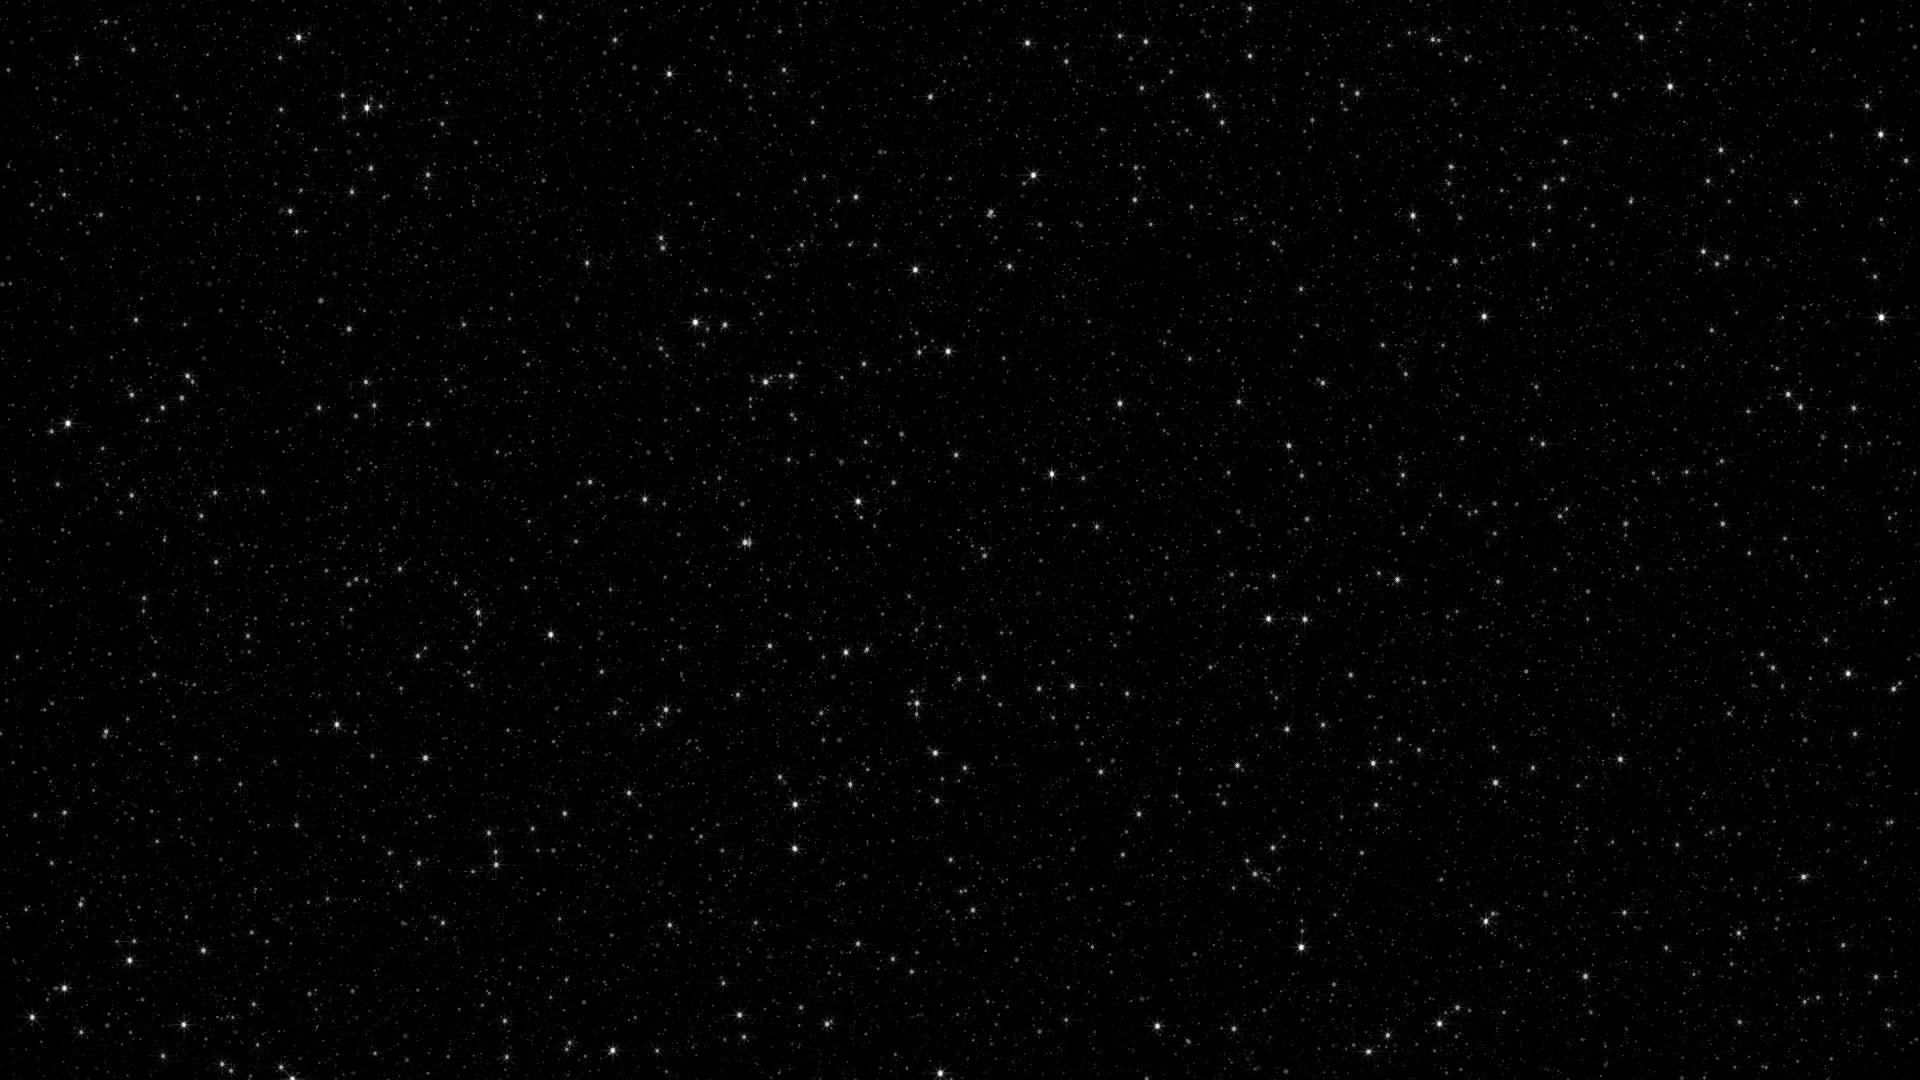 Night Sky 003: A night sky with a twinkling star field (Loop ...